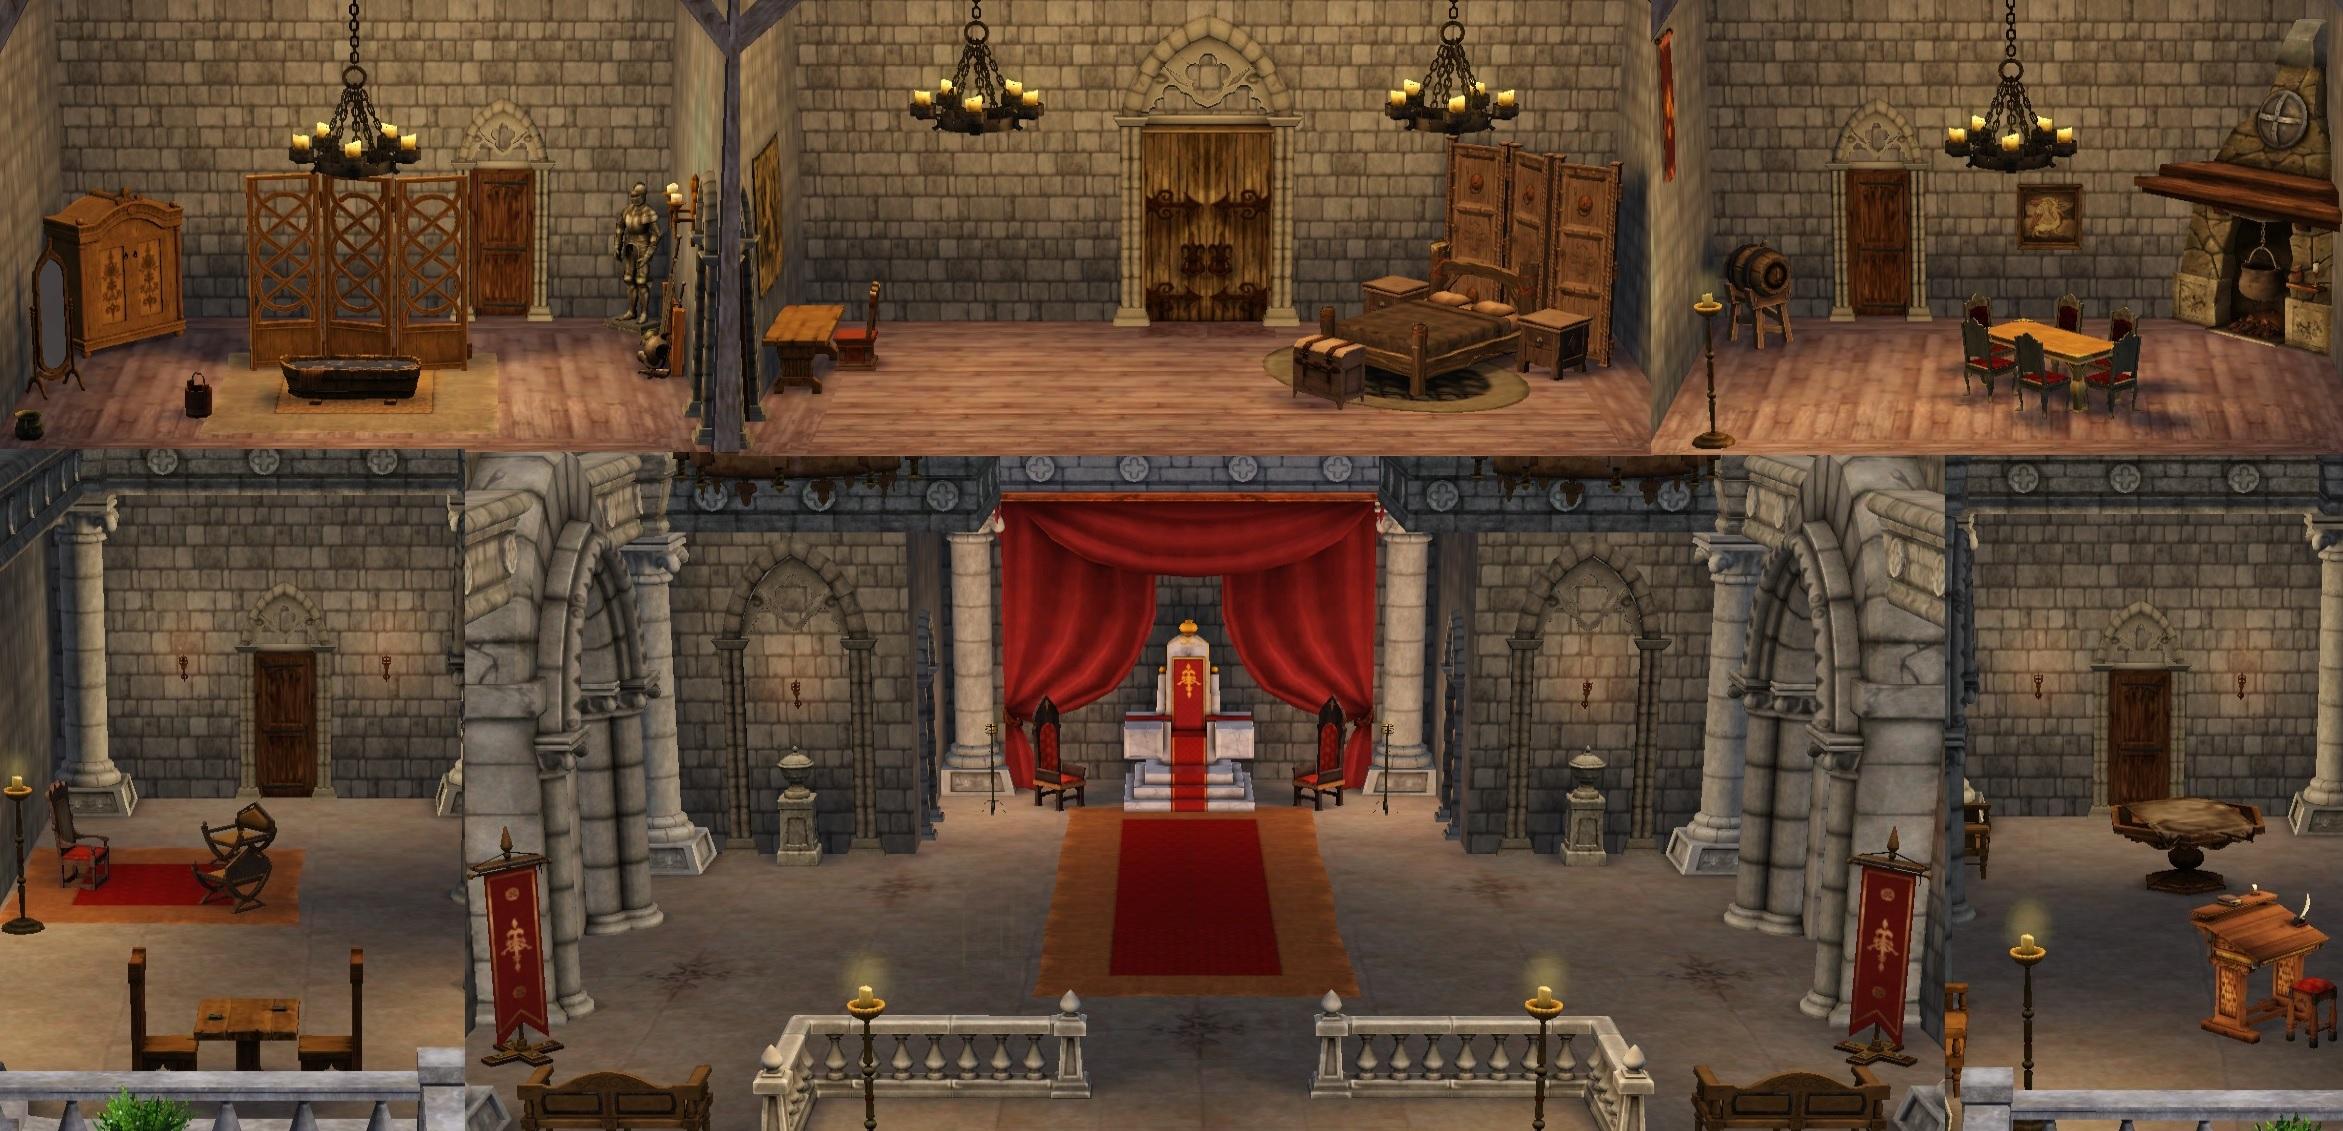 Throne Room Traditional.jpg